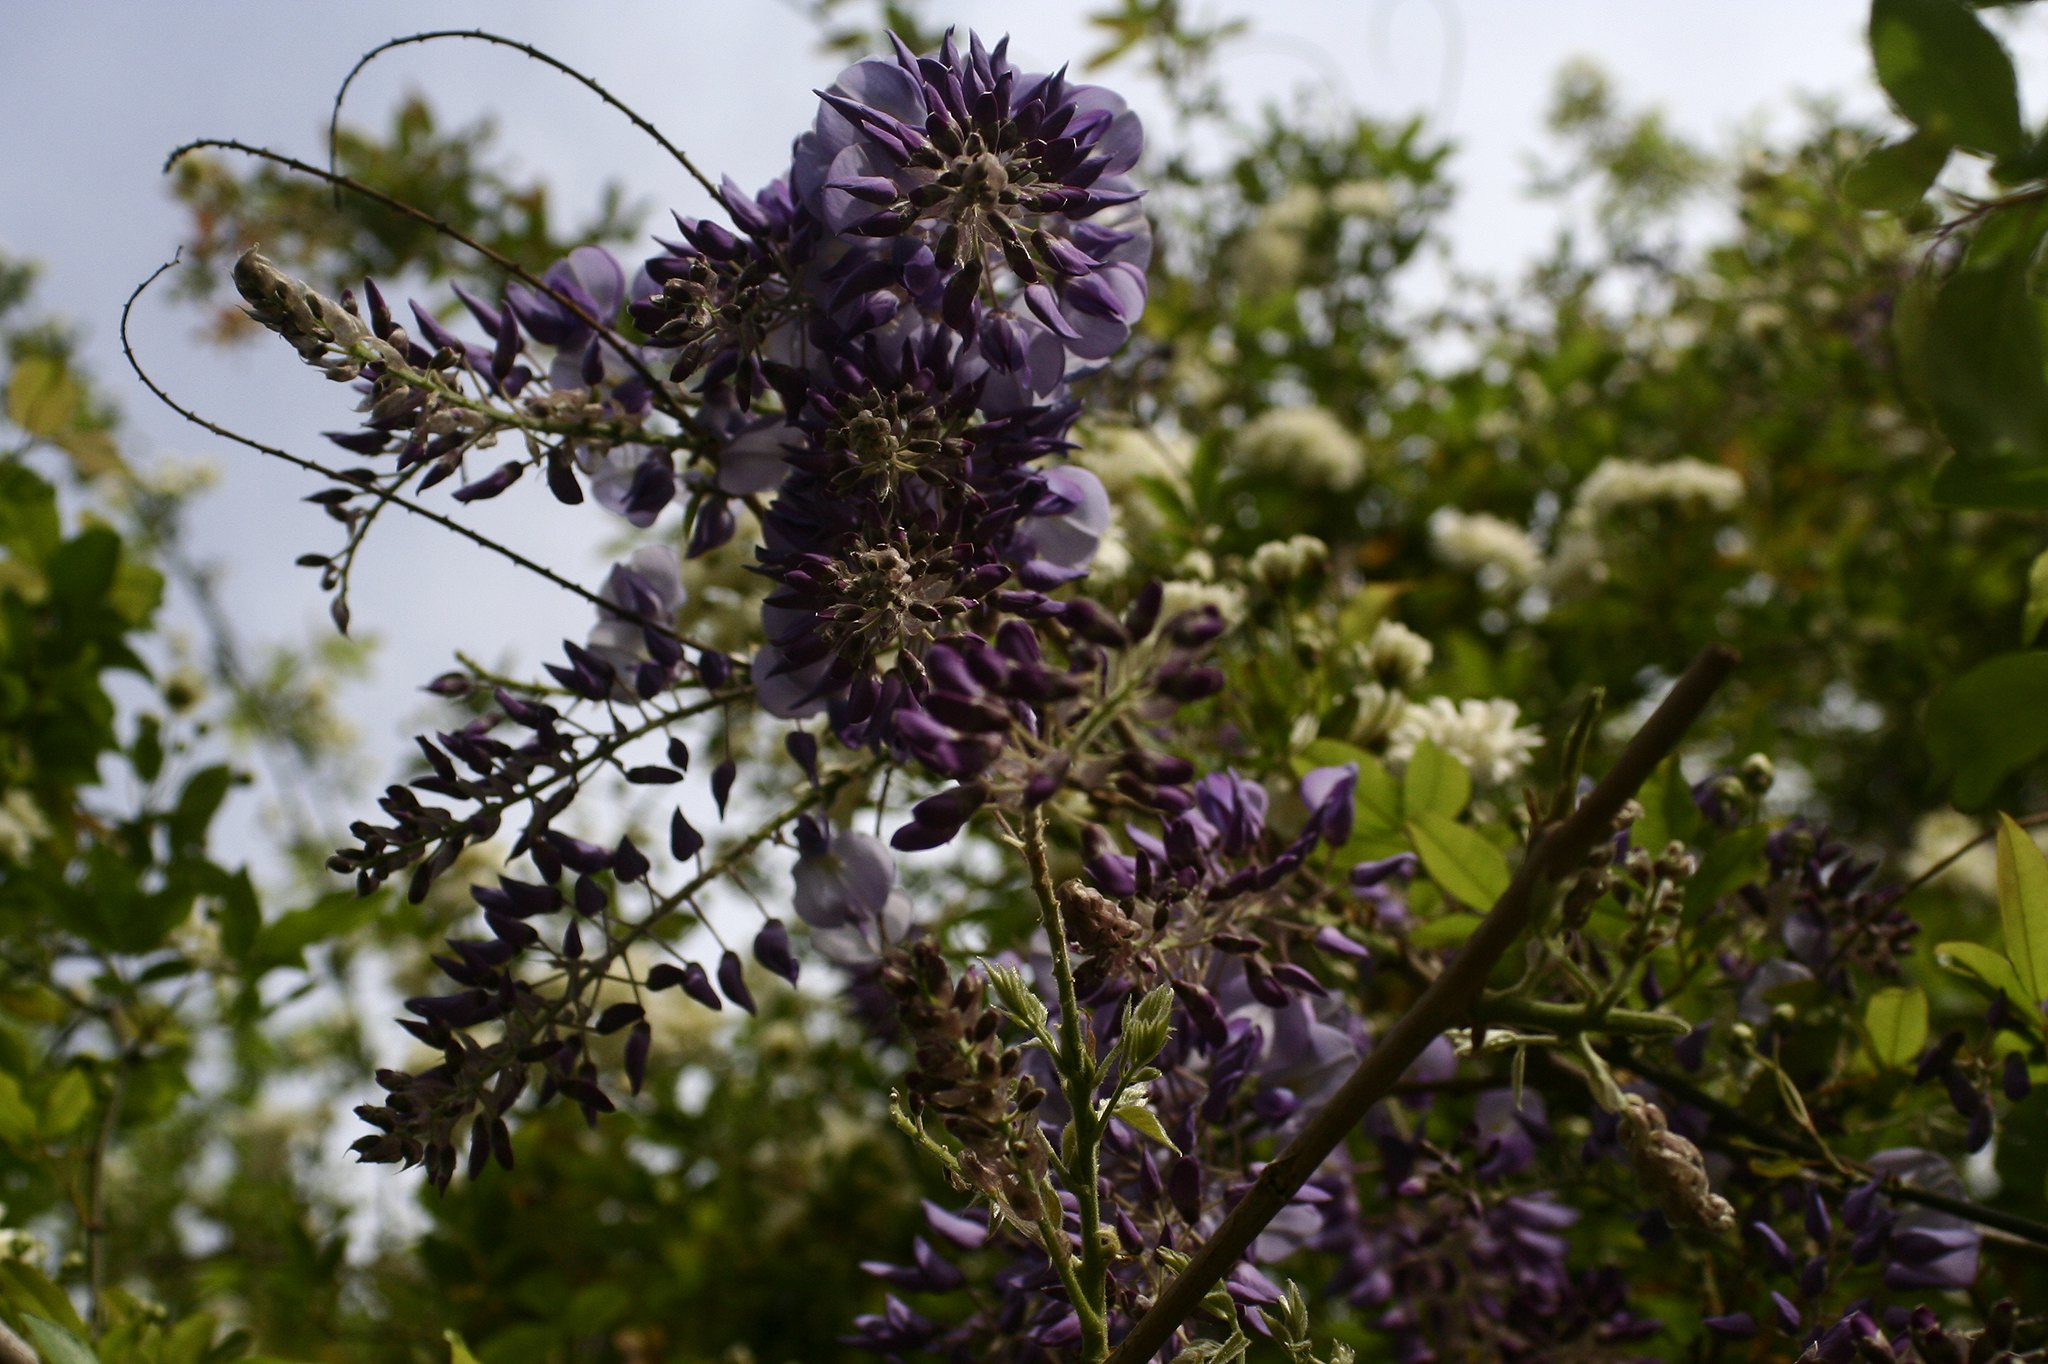 The start of wisteria season